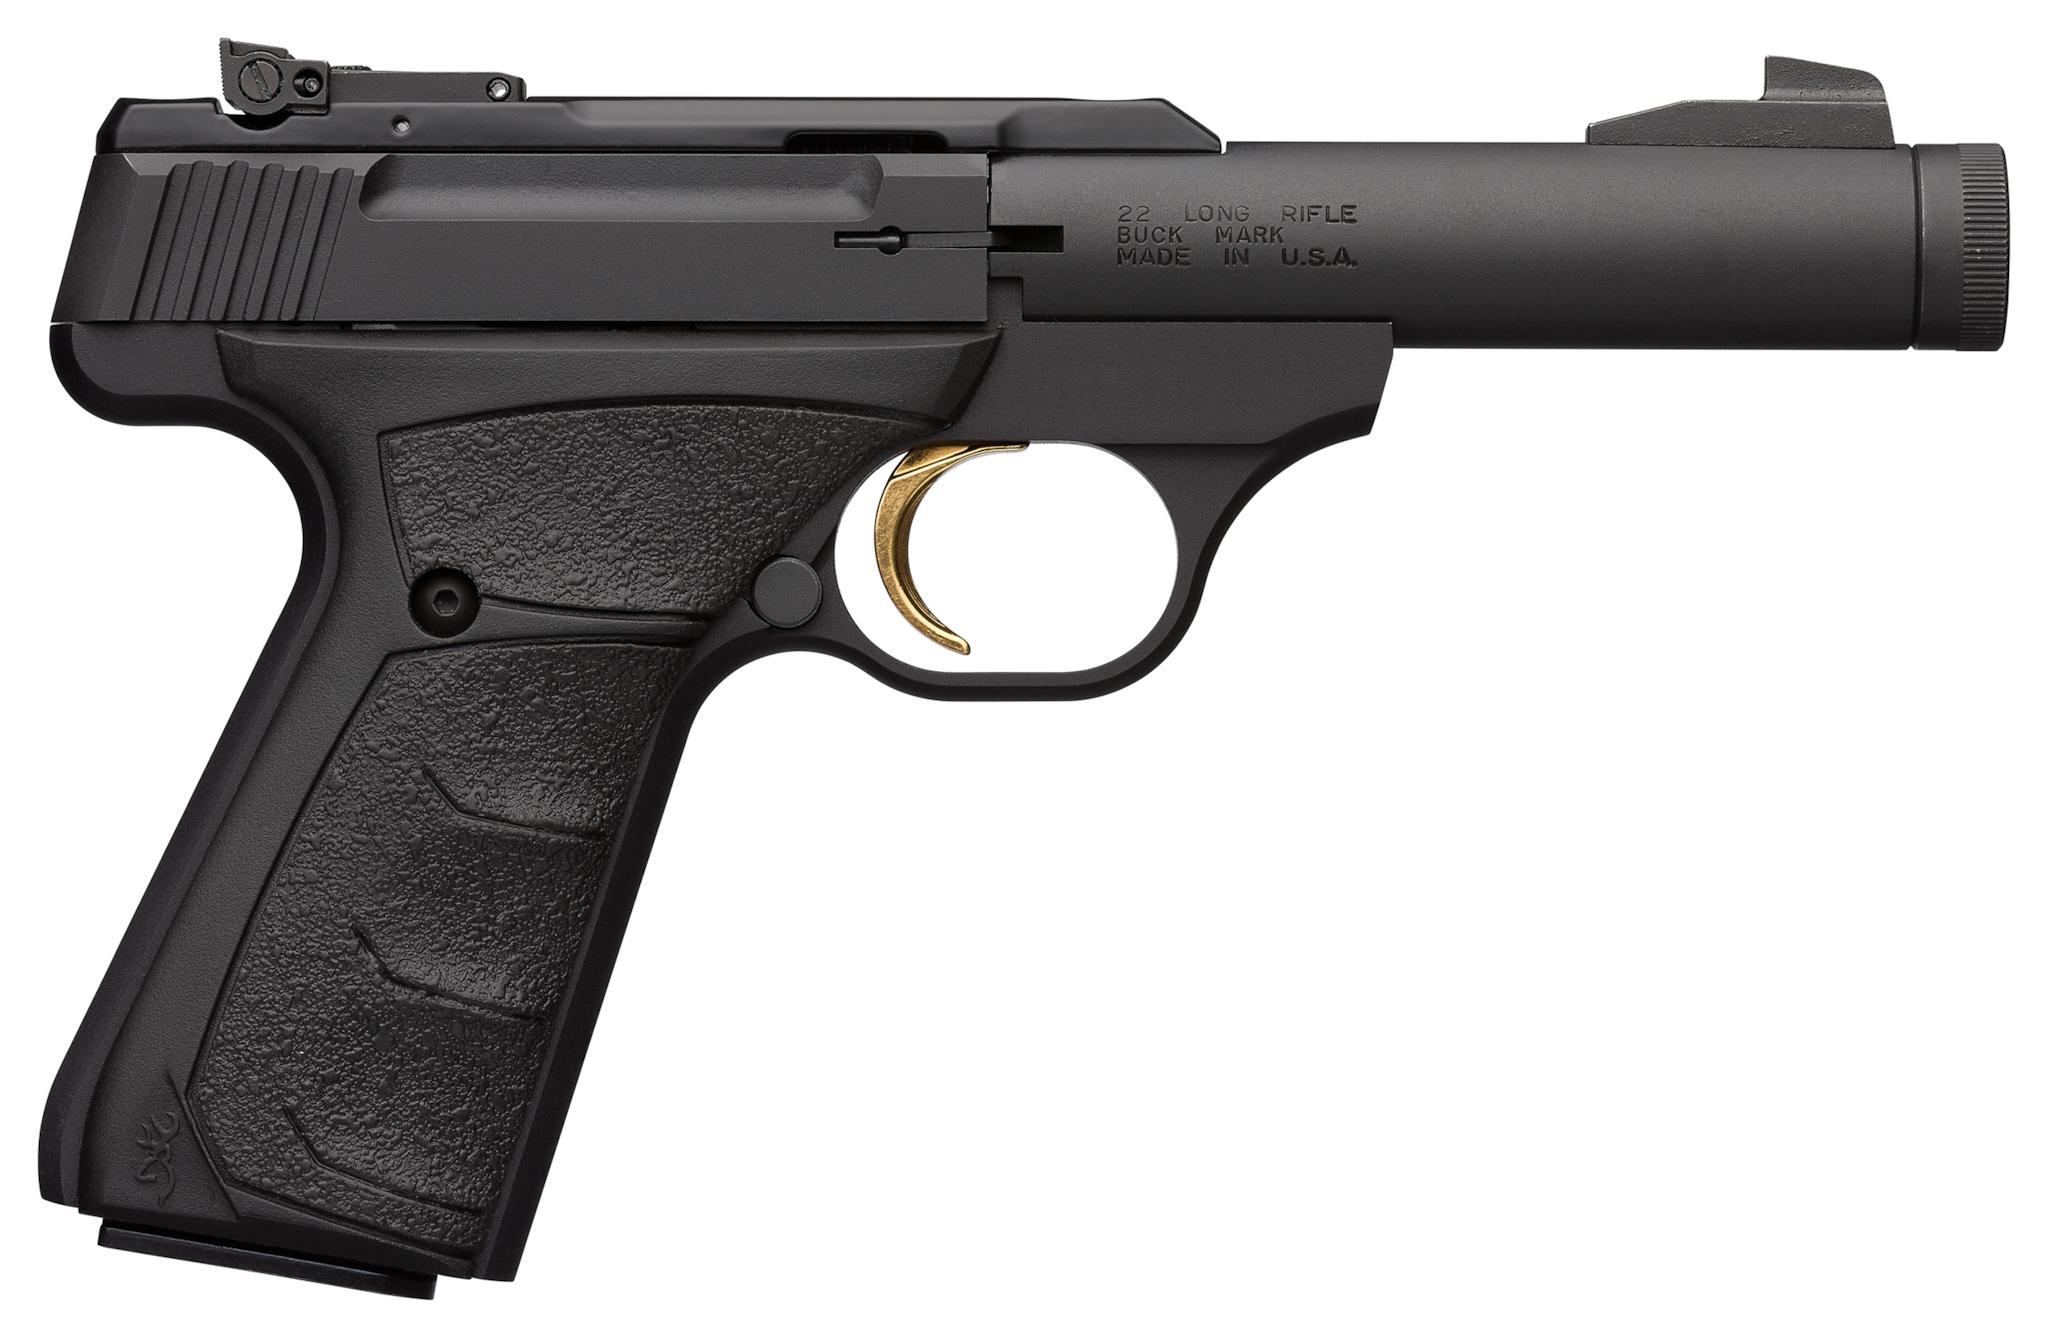 Browning Buck Mark Micro SR